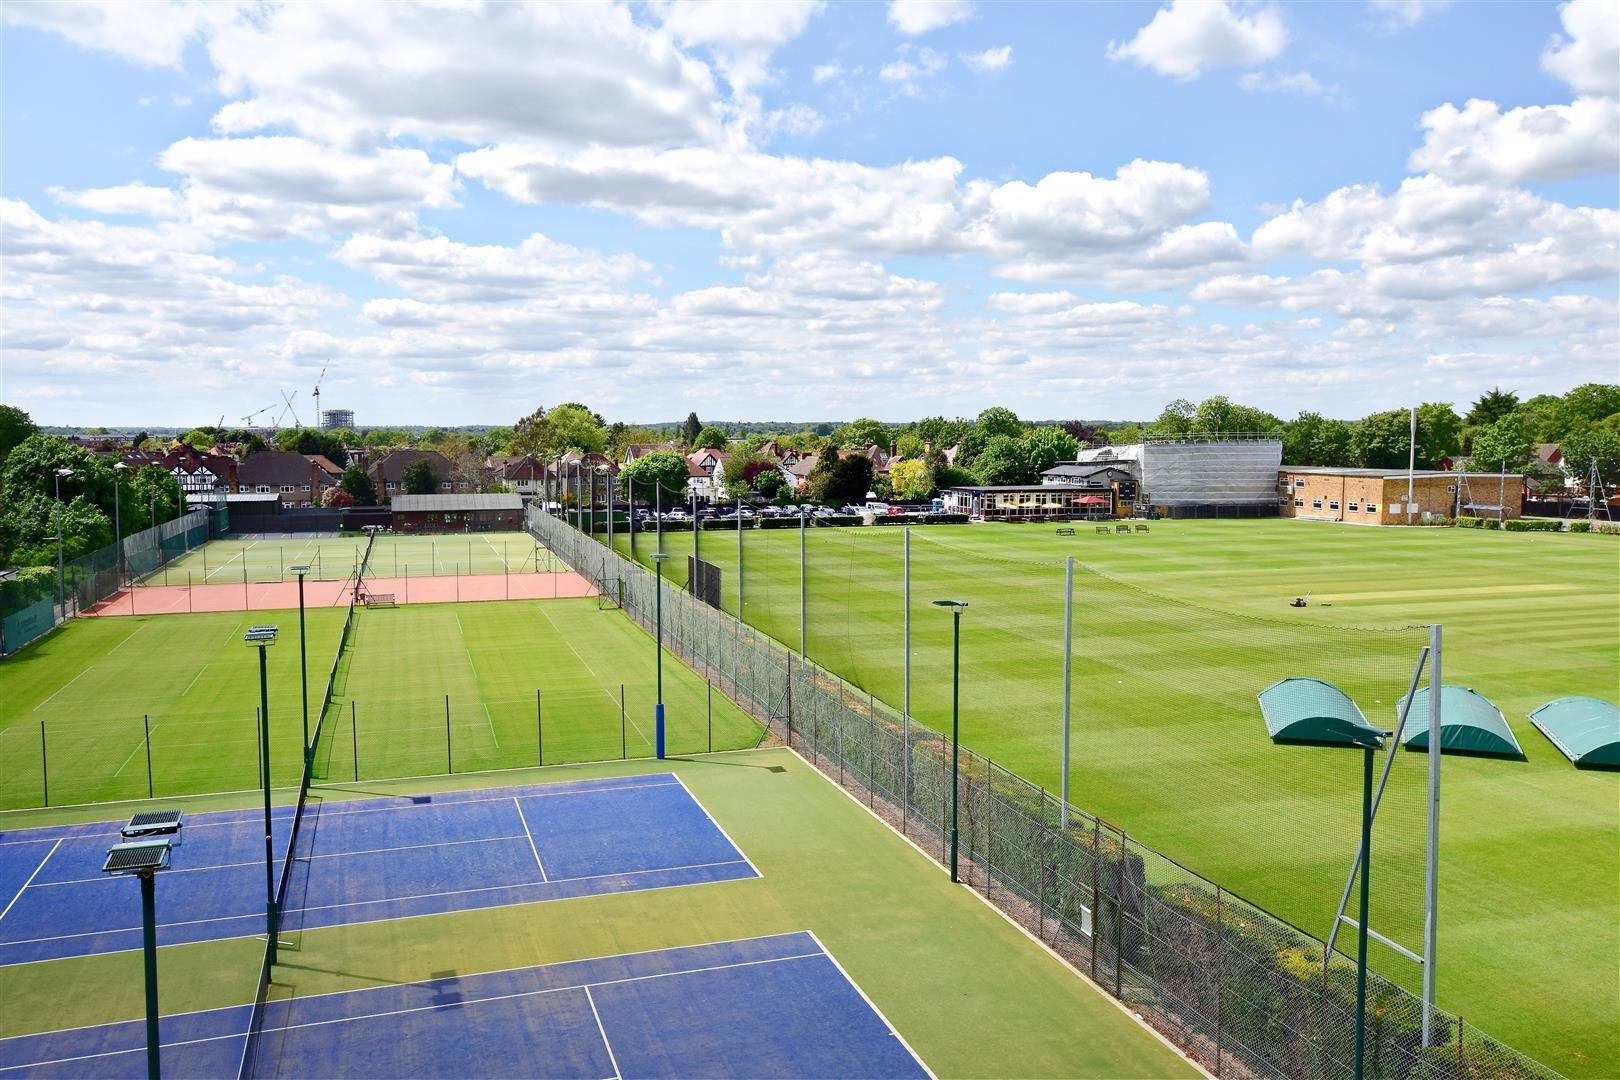 Property photo 1 of 10. Tennis Court.Jpg